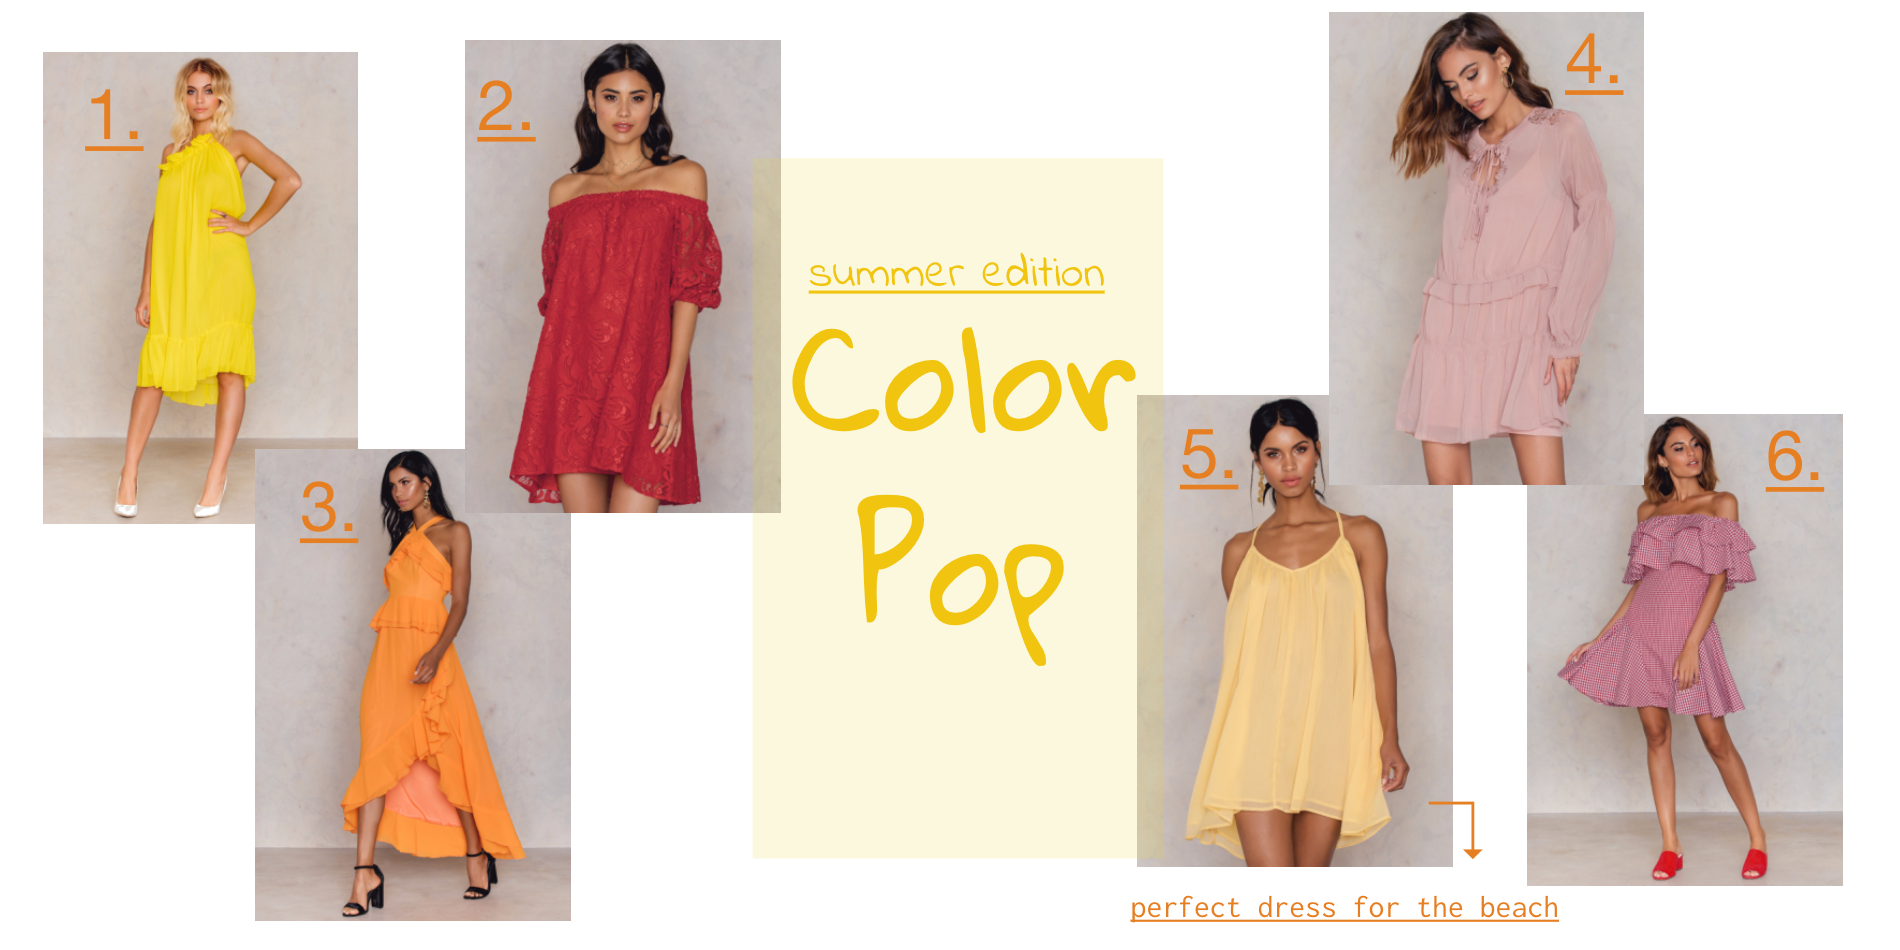 Summer dresses - color pop